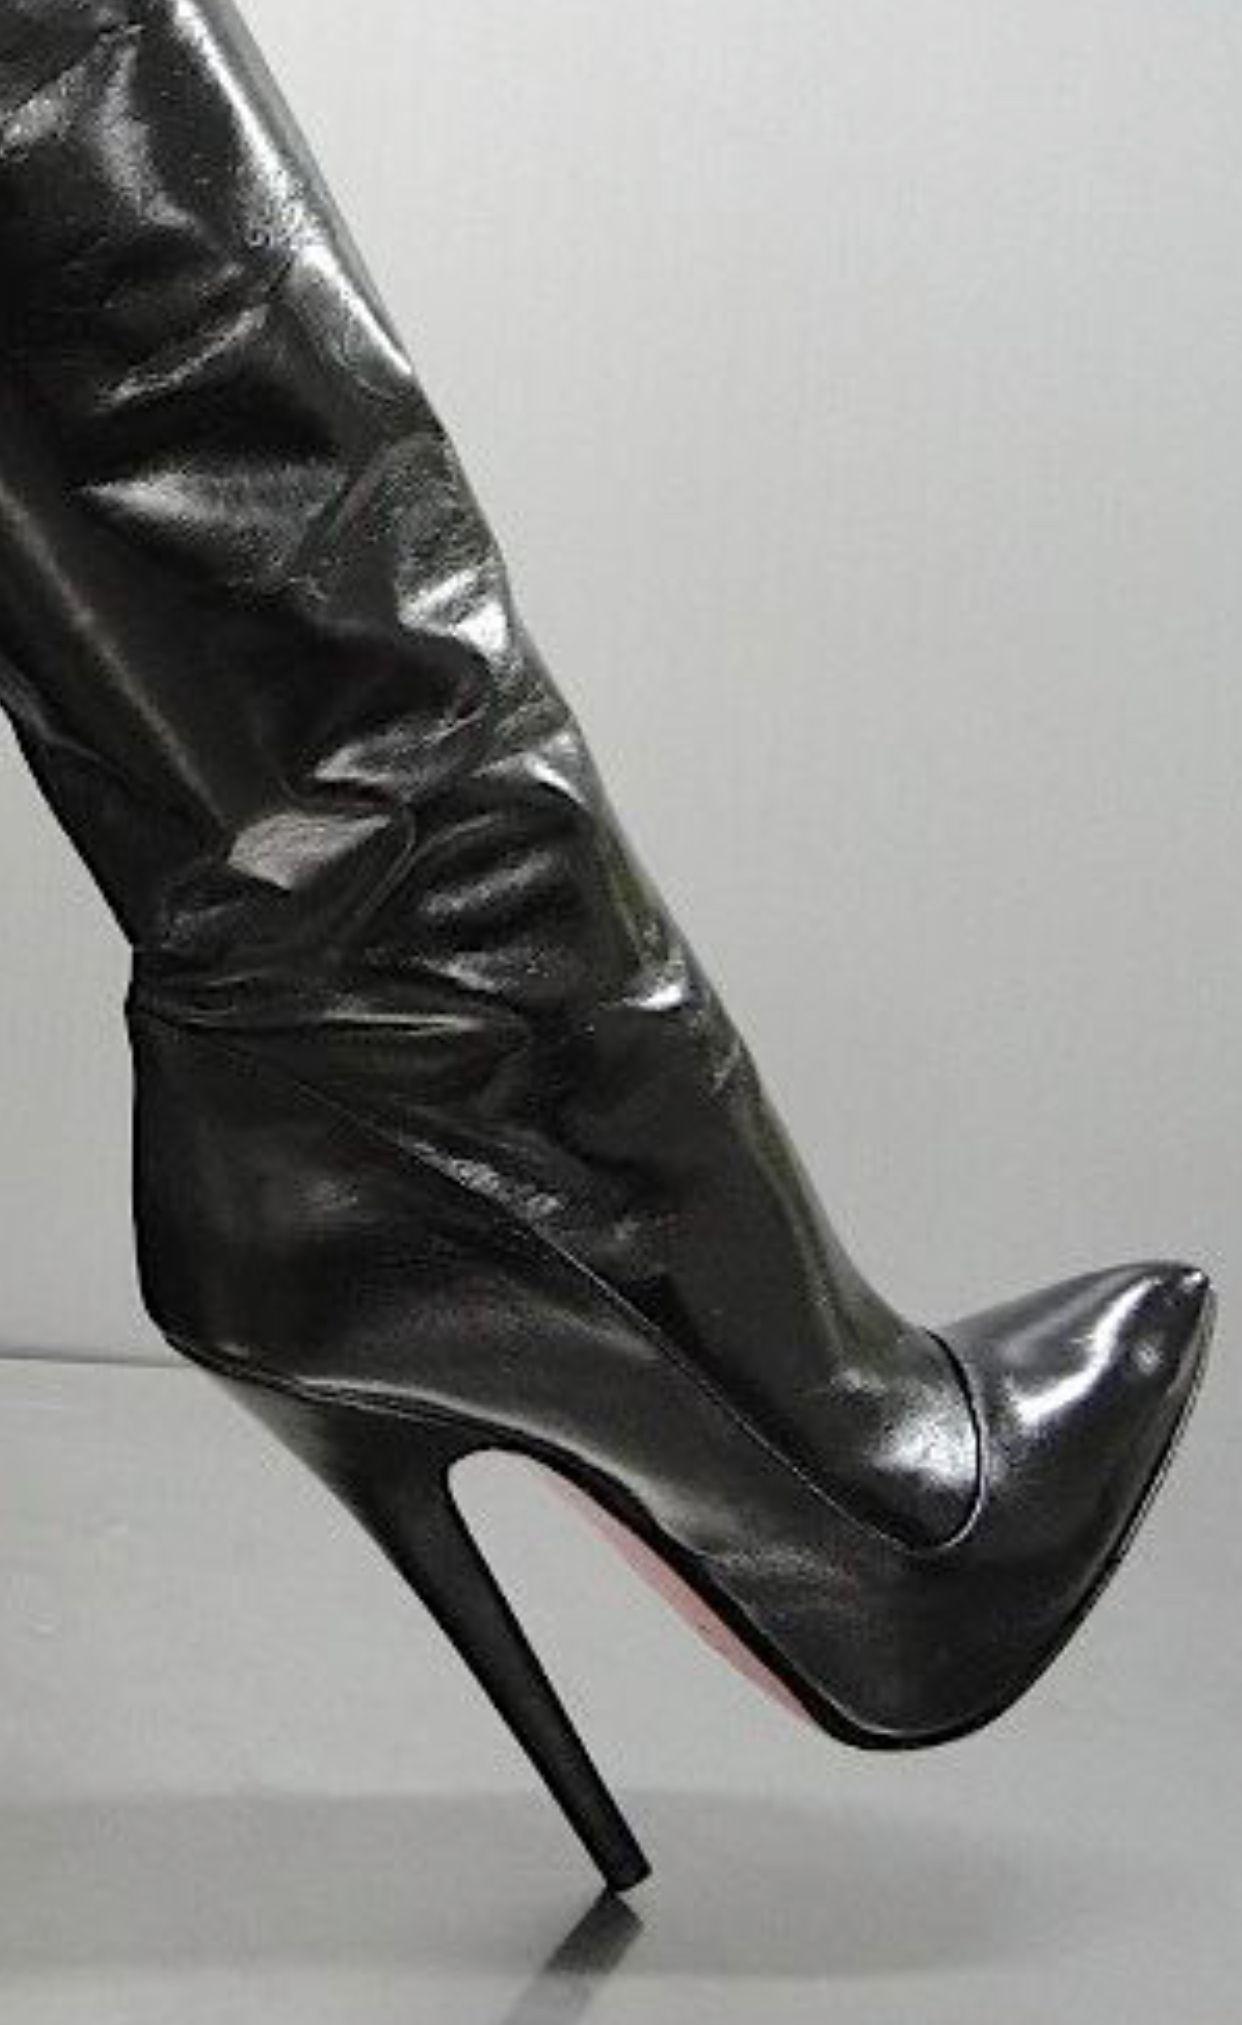 Stiefel   Hochhackige stiefel, Stiefel, Jeans stiefel